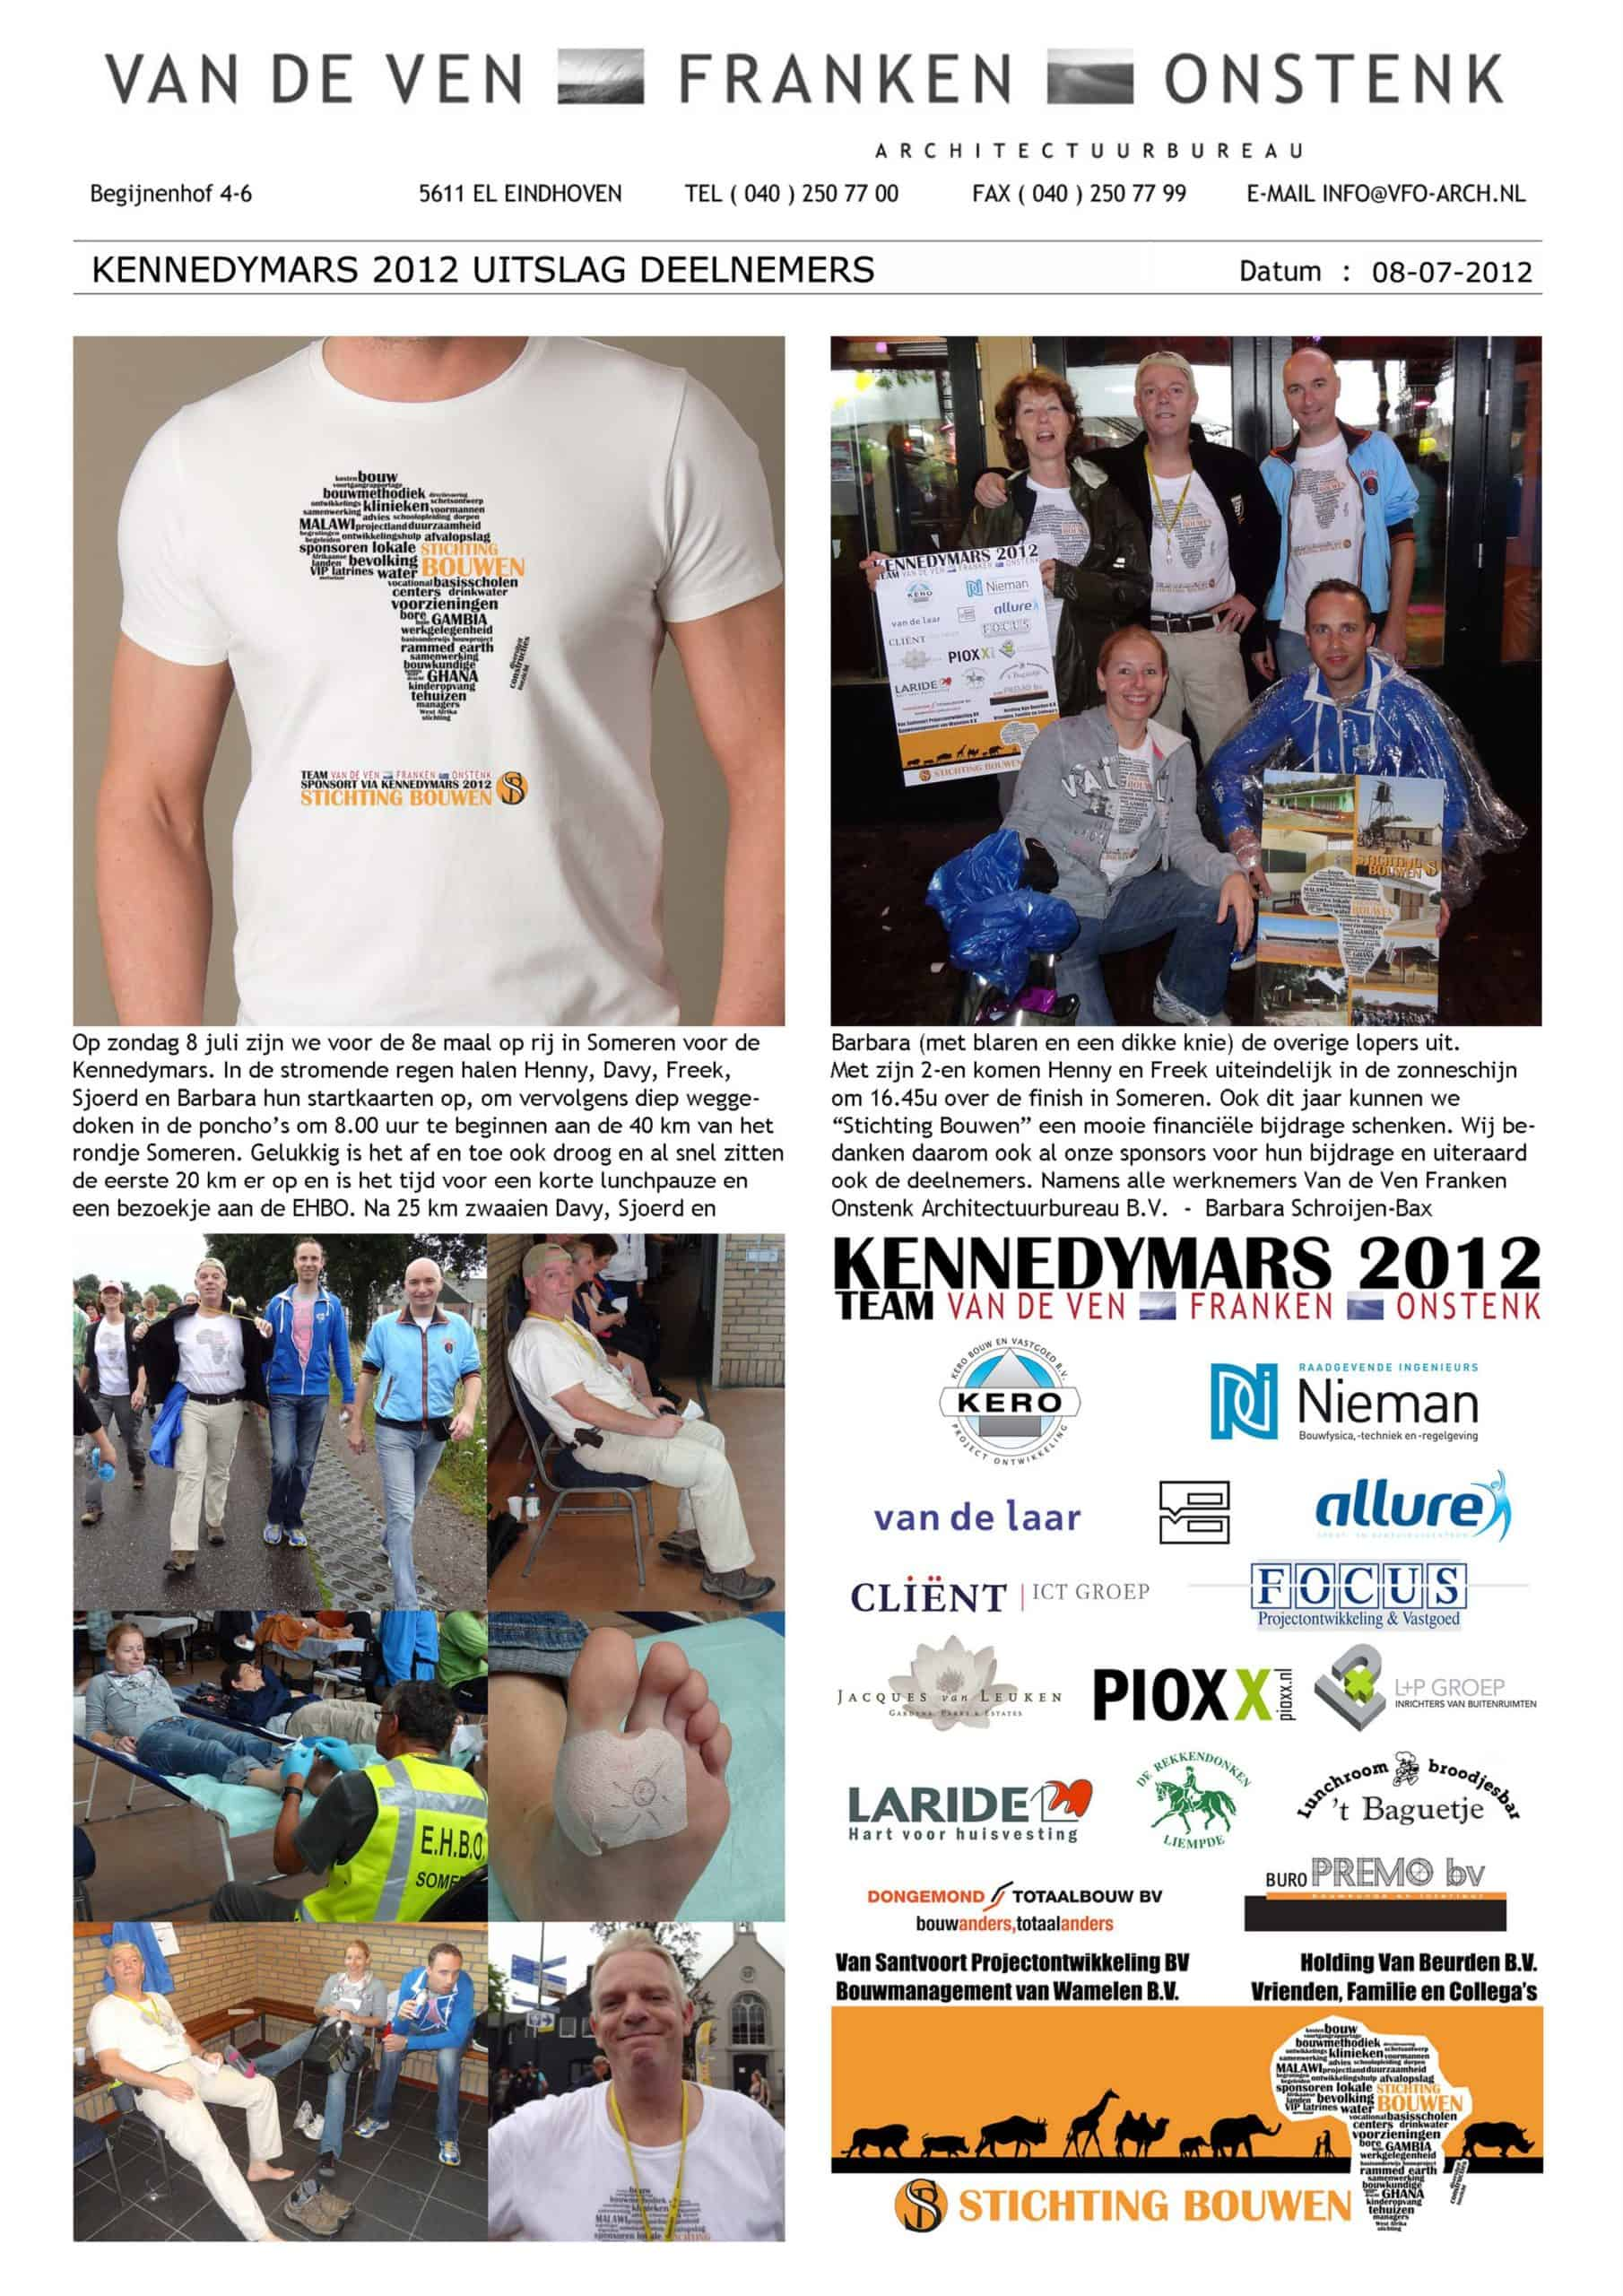 Kennedymars-2012-uitslag-deelnemers_PDFA3-1-scaled